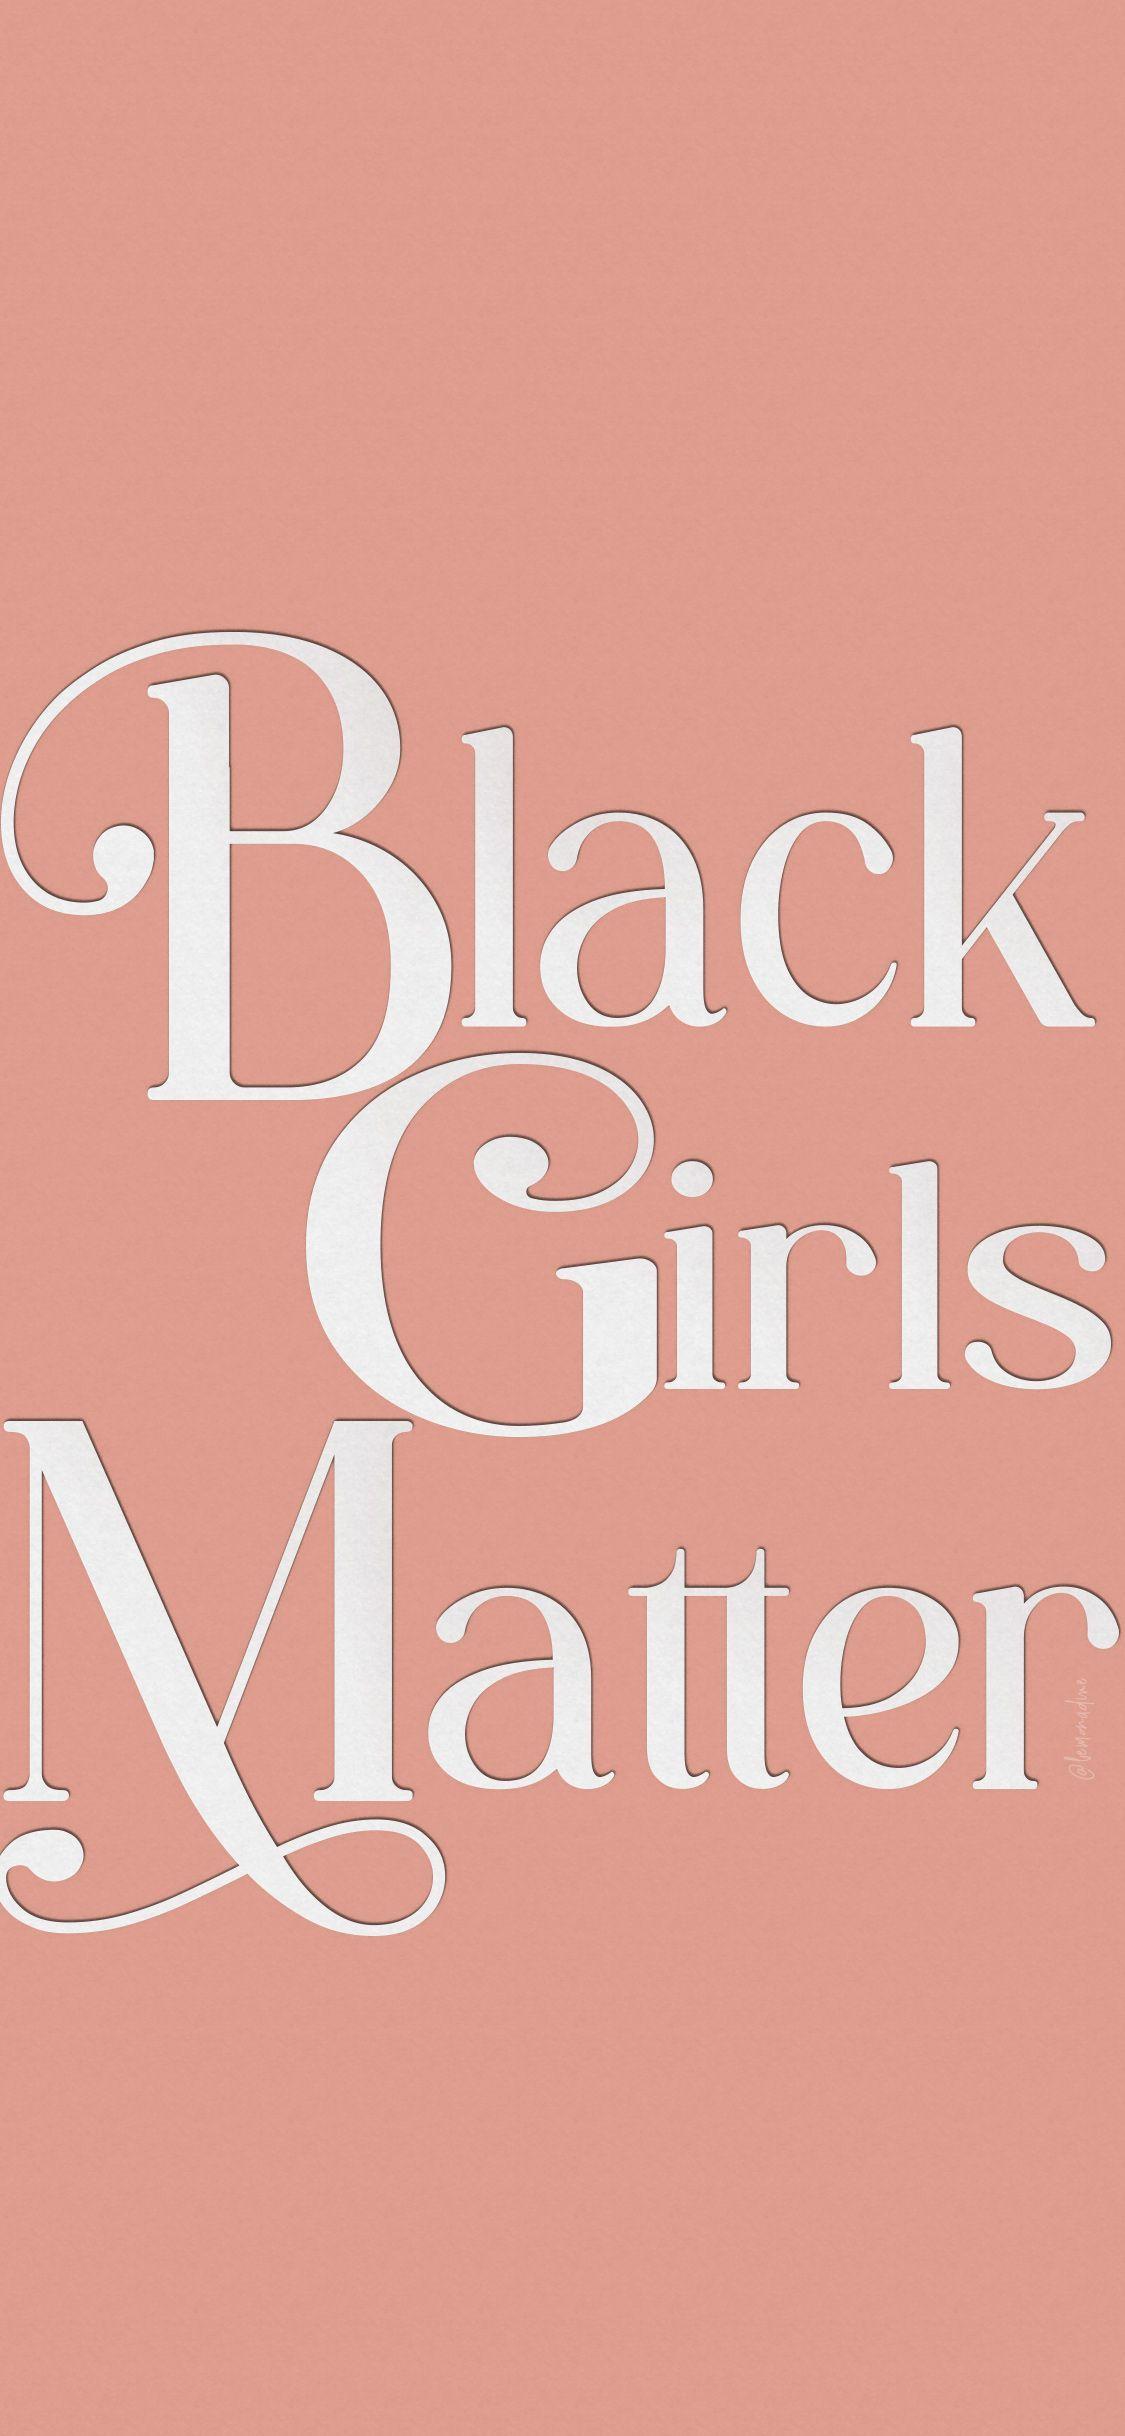 Pin On Phone Wallpaper Girl Boss Wallpaper Black Lives Matter Quotes Black Girl Quotes